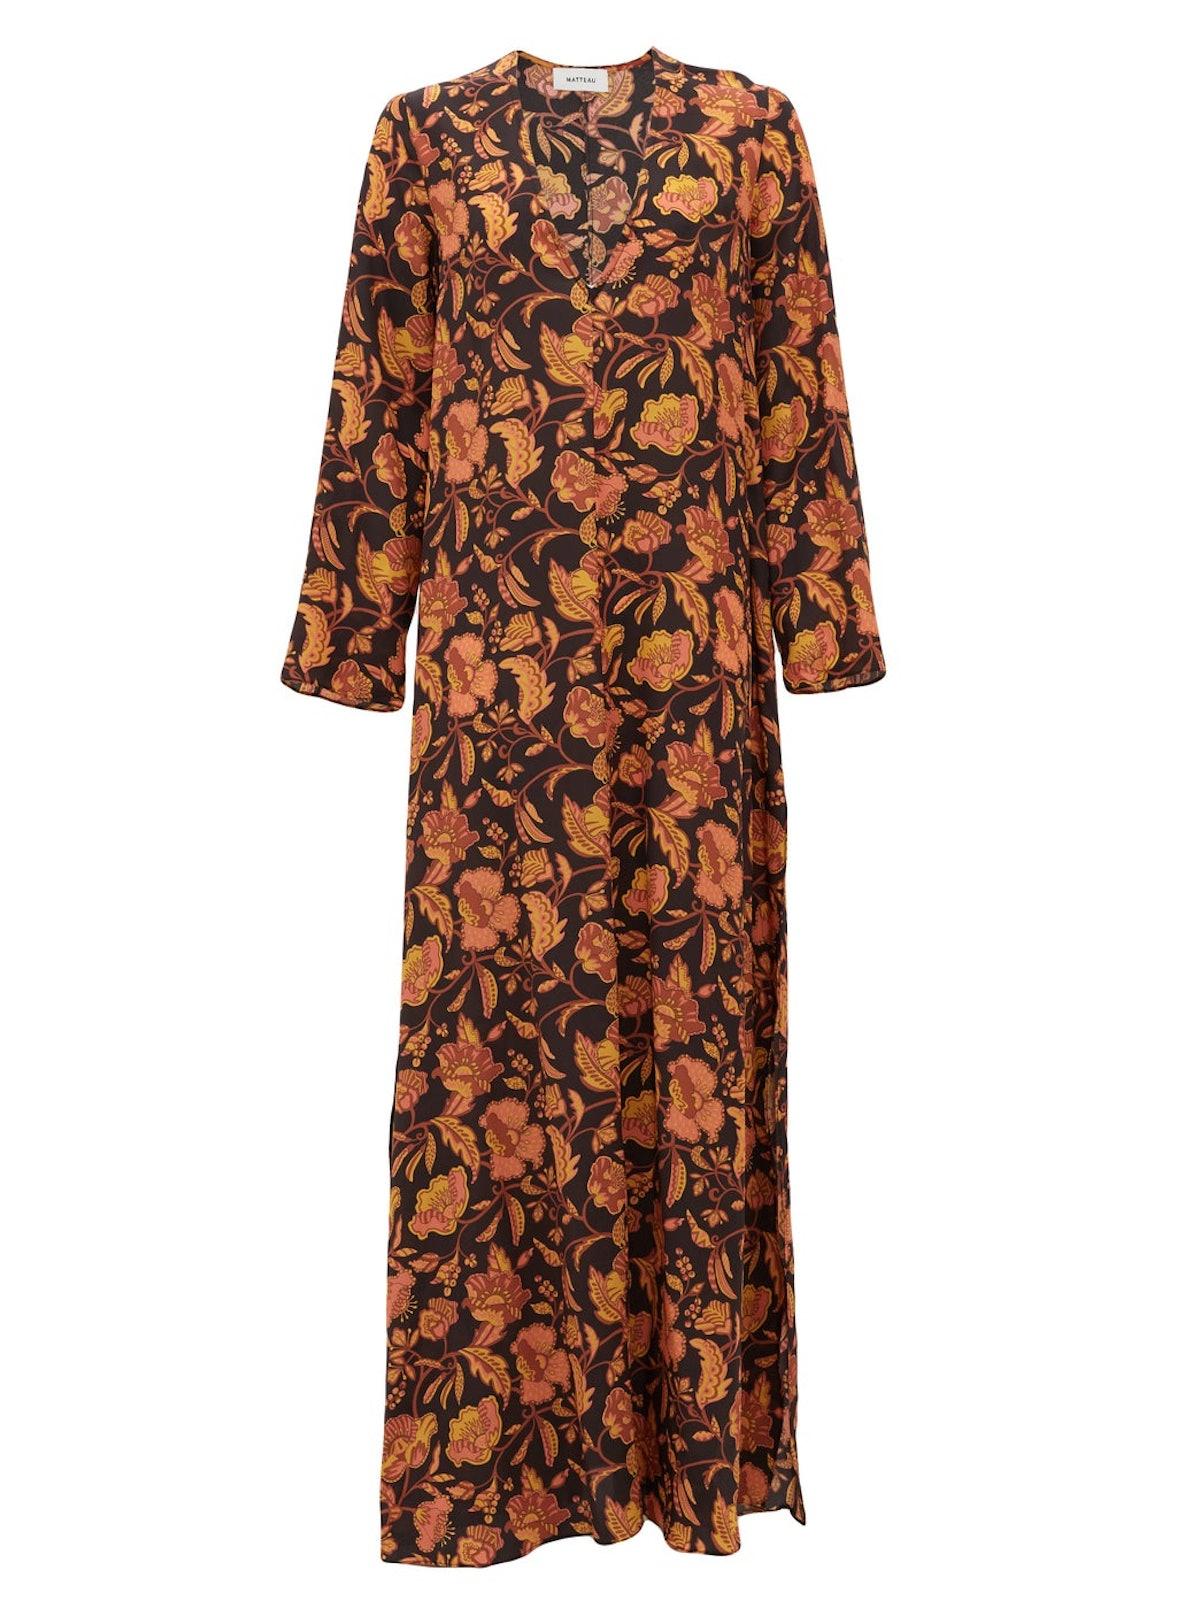 The Long Floral-Print Silk Maxi Dress